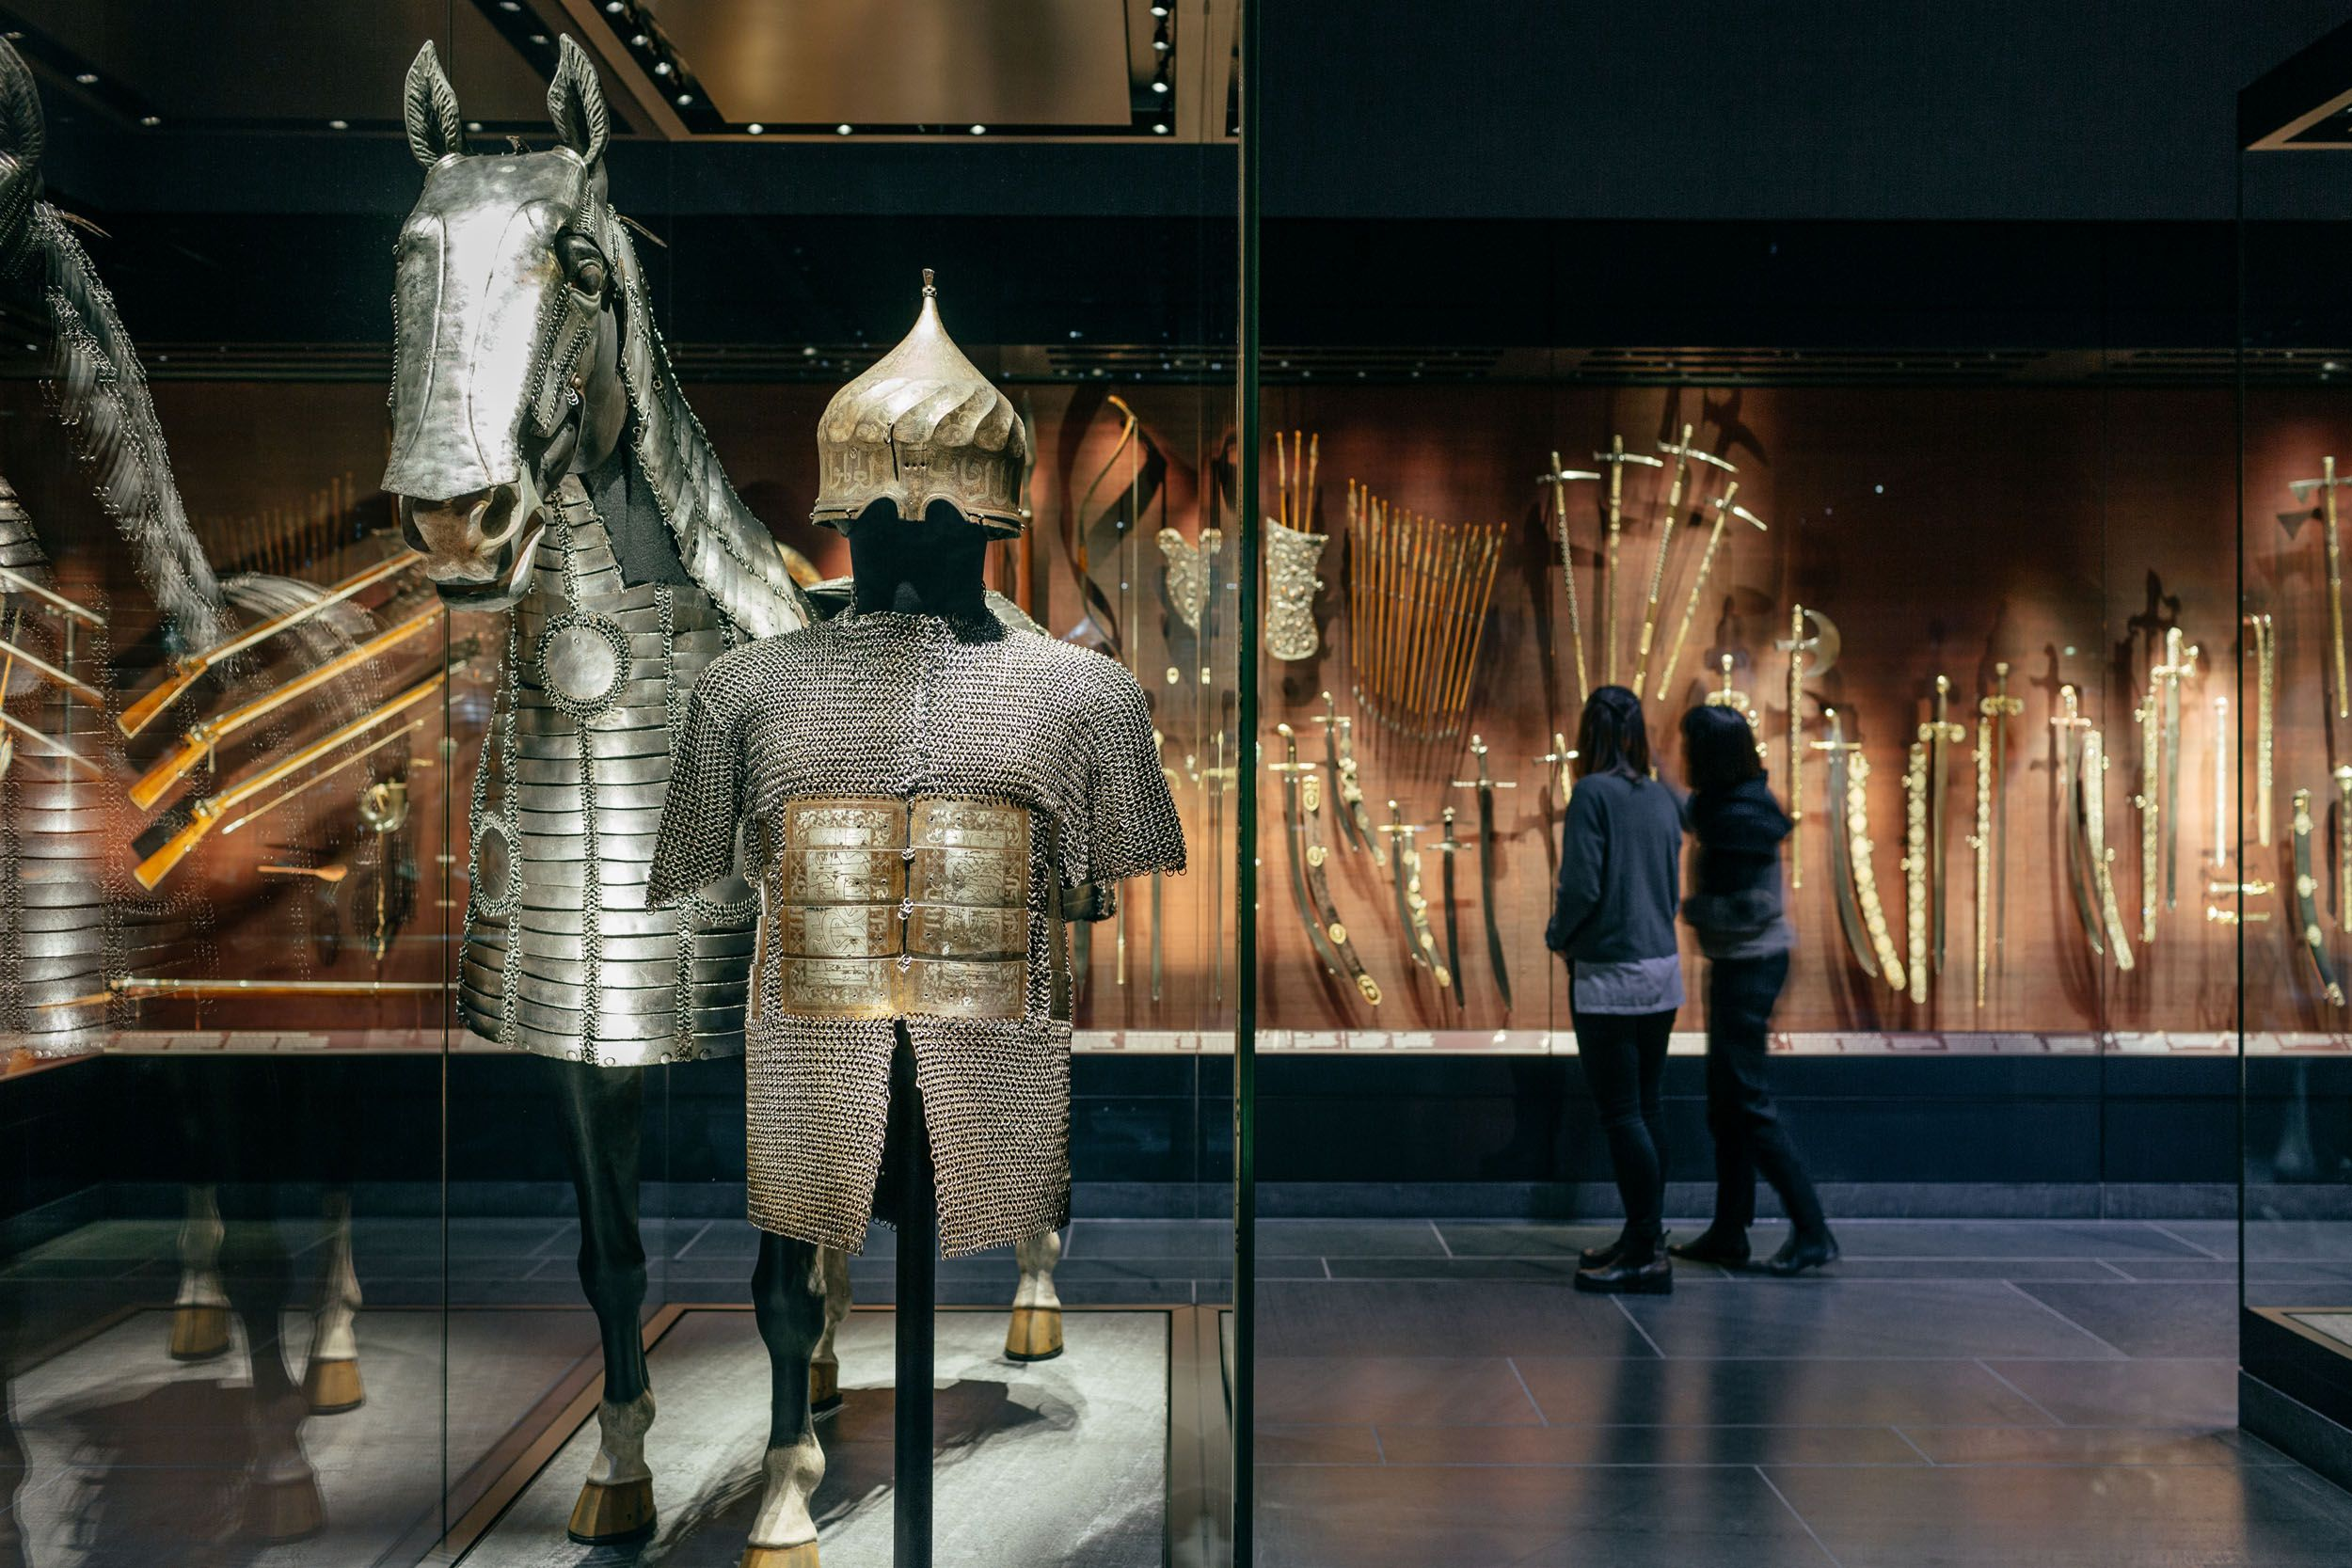 Rustkammer Turckische Cammer Ausstellung Dresden Museum